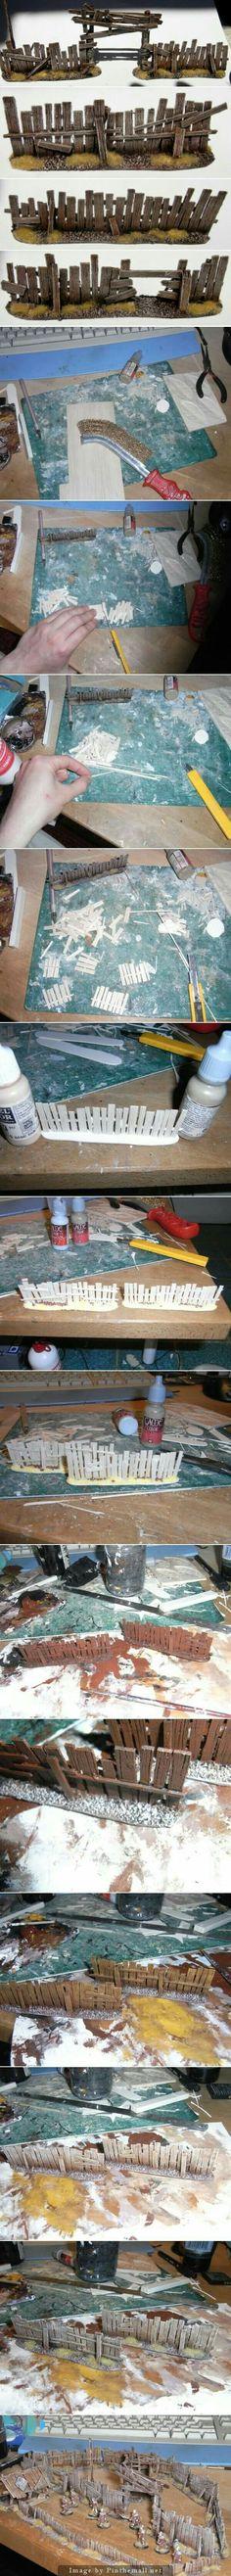 Fence wood diorama model basis #modeltrains